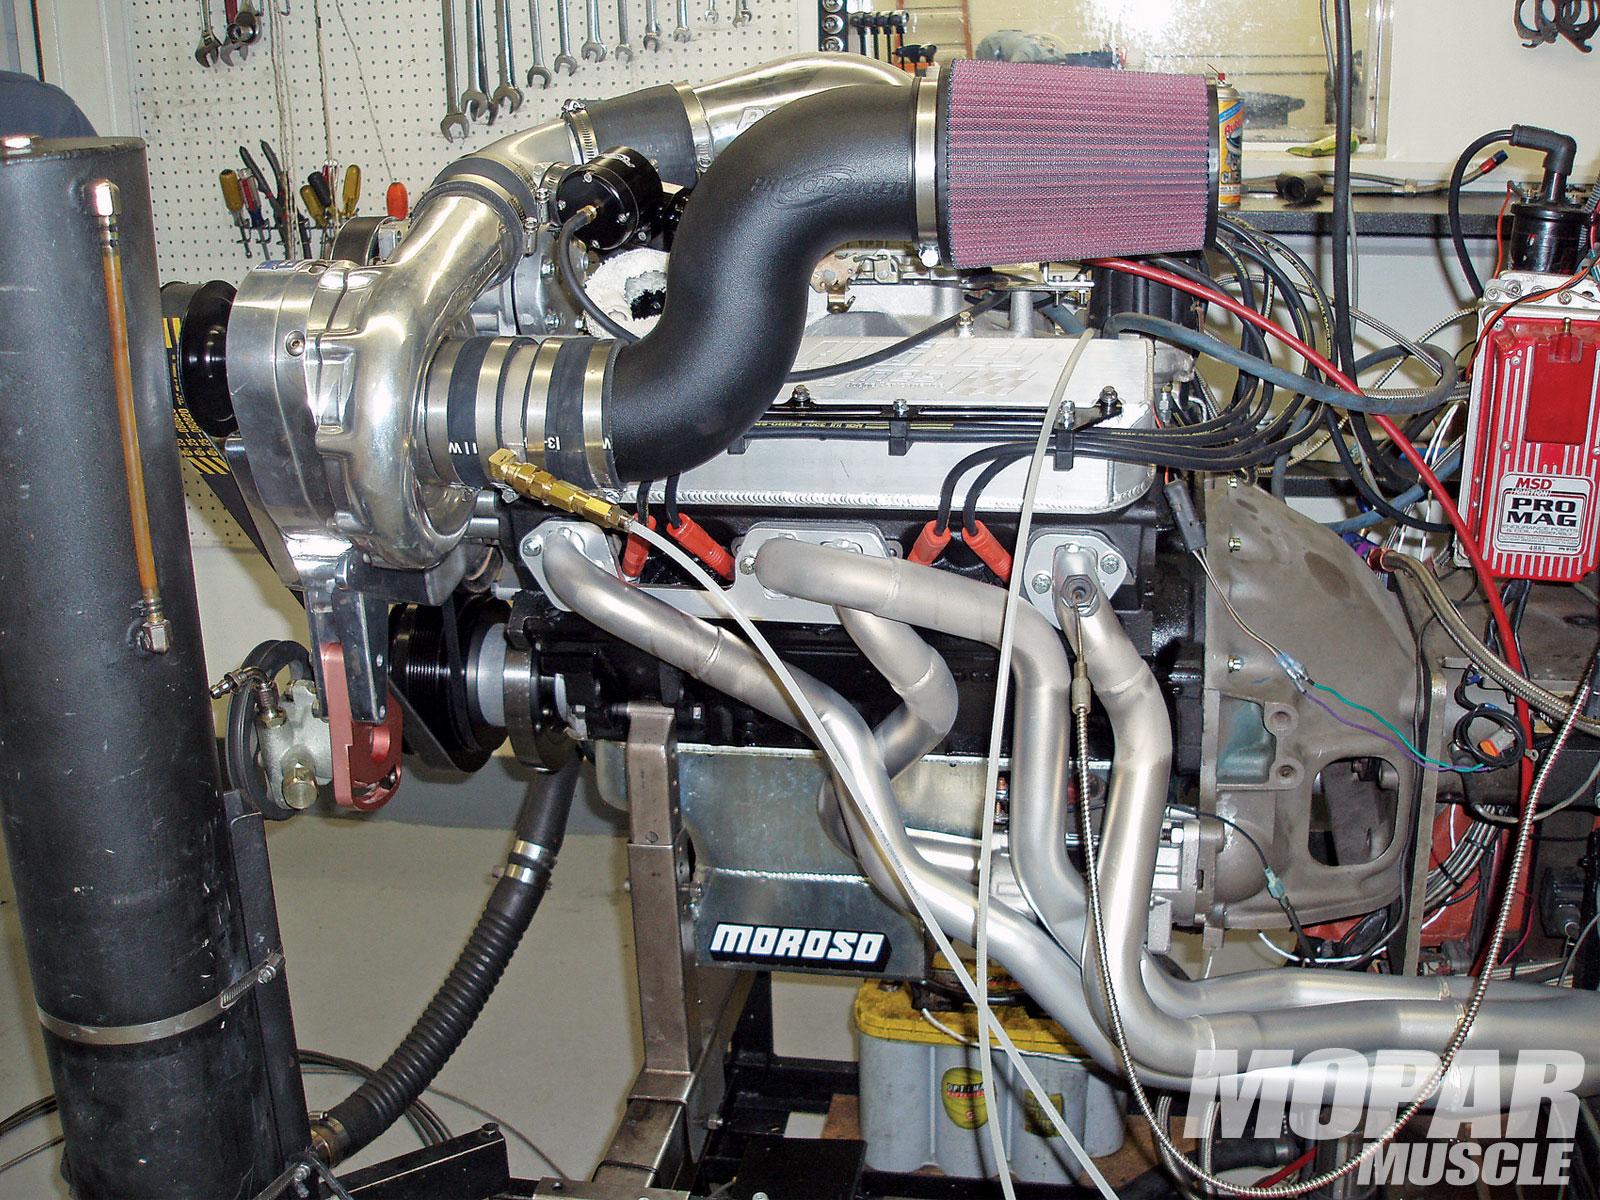 hight resolution of mopp 1005 01 o chrysler 318 engine 318 engine